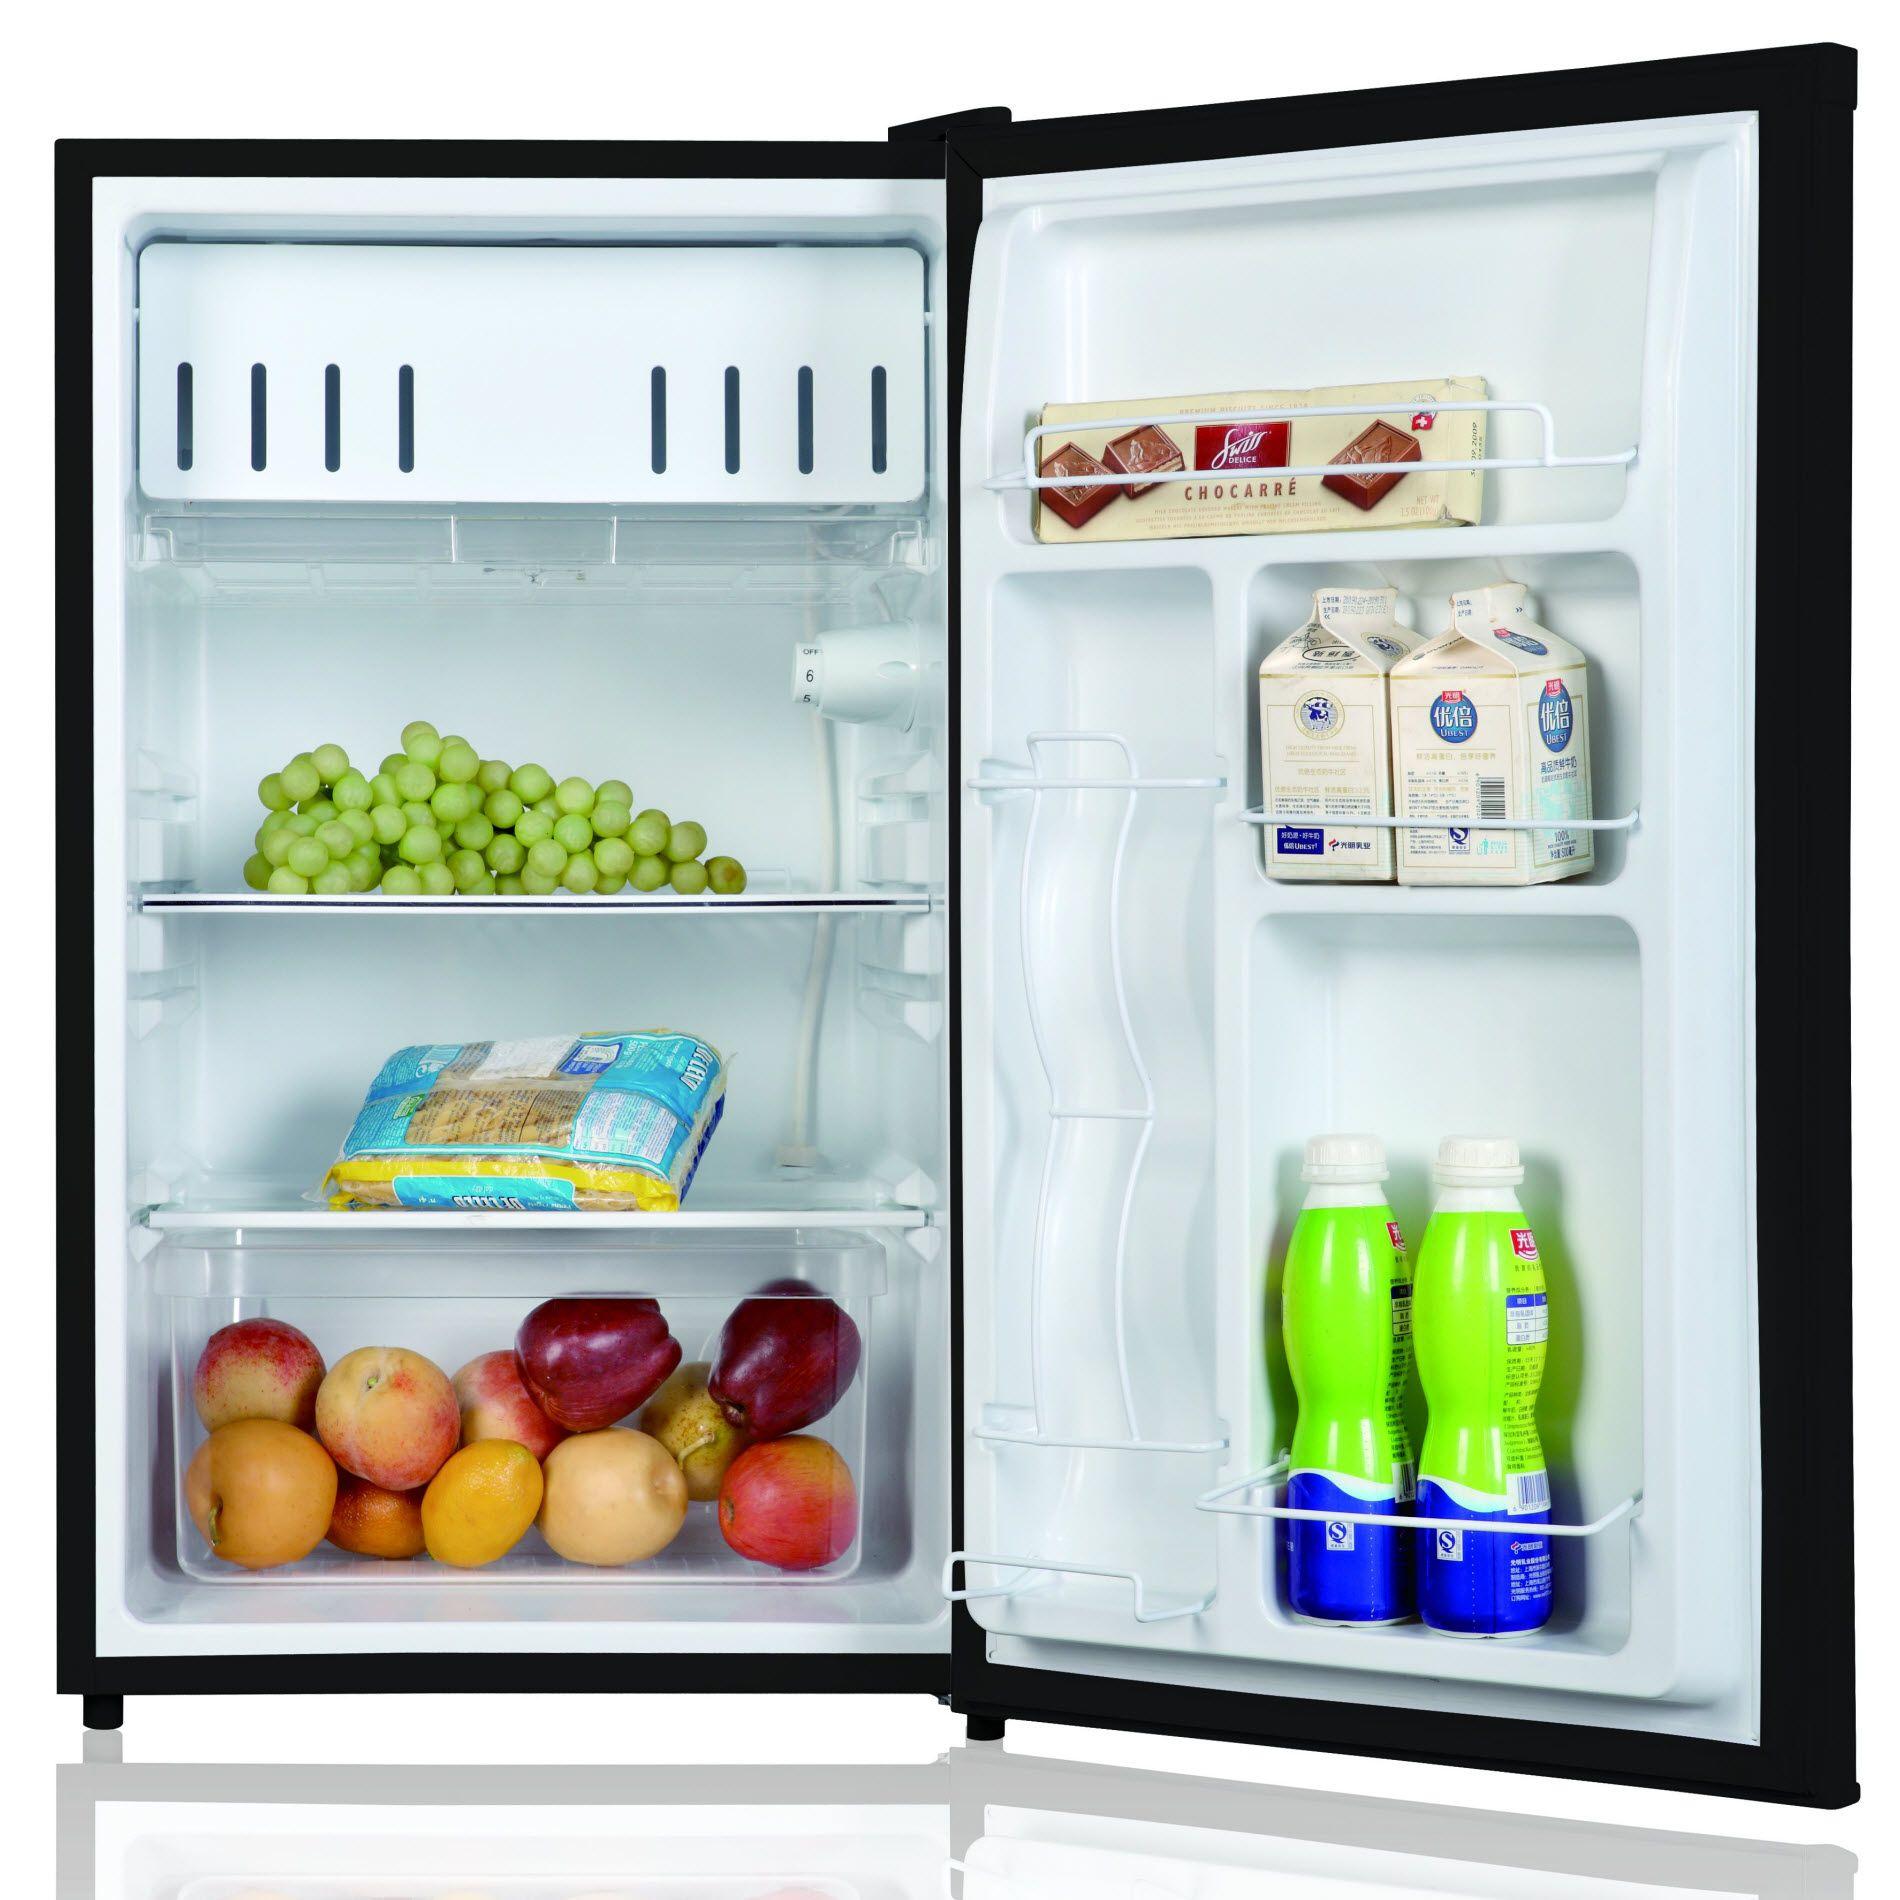 Kenmore 4.3 cu. ft. Compact Refrigerator